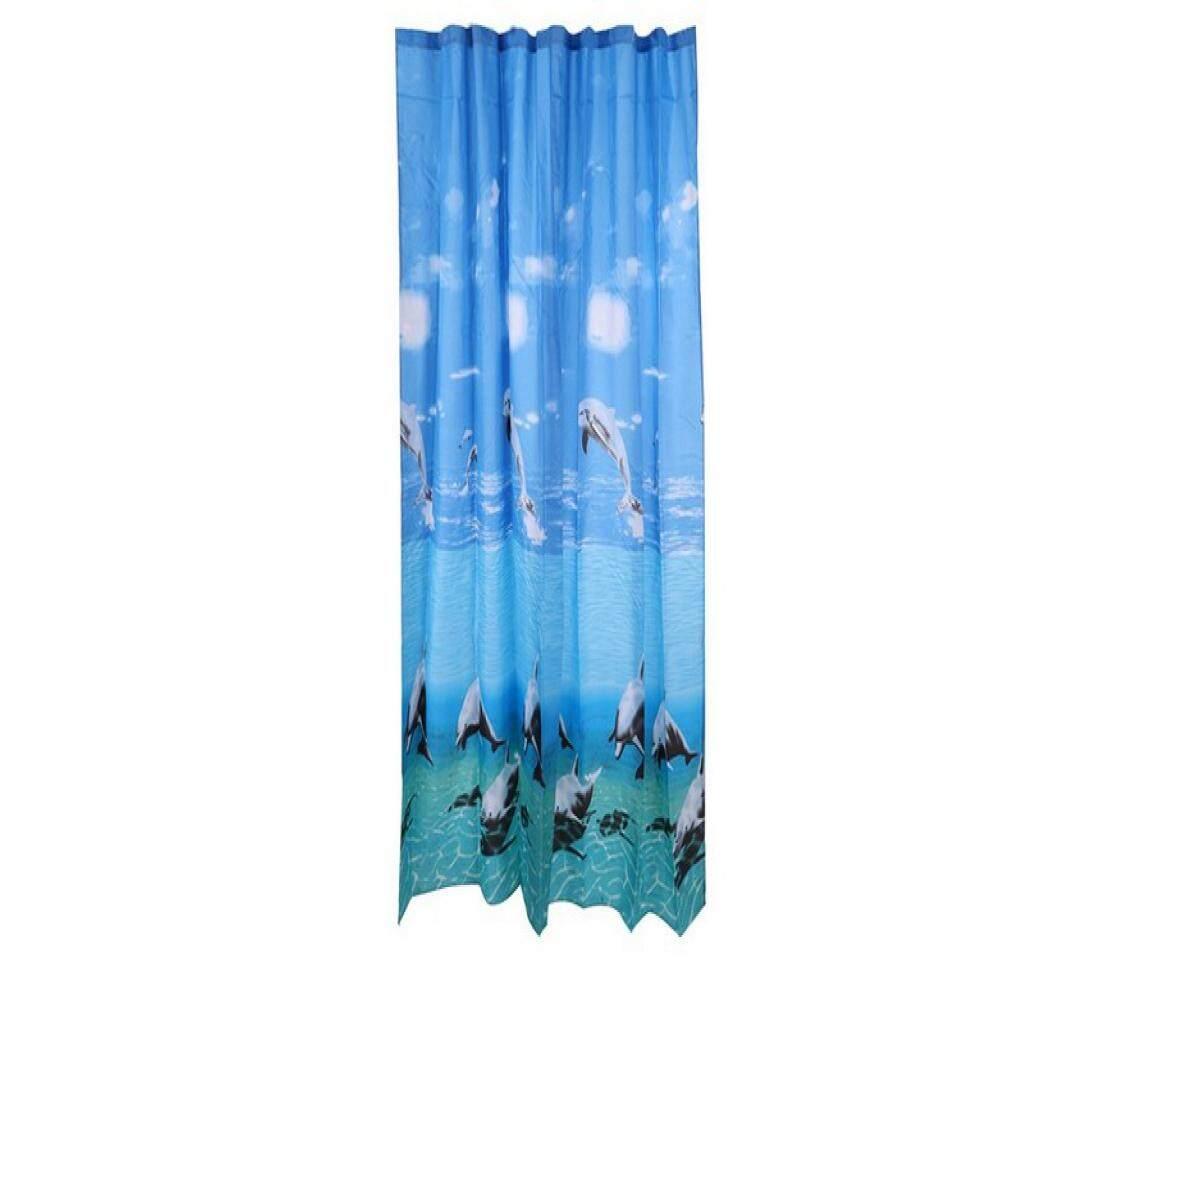 Shower Curtain 180x180 ม่านห้องน้ำ Poly Moya H842 180x180 By The Eight Shop.